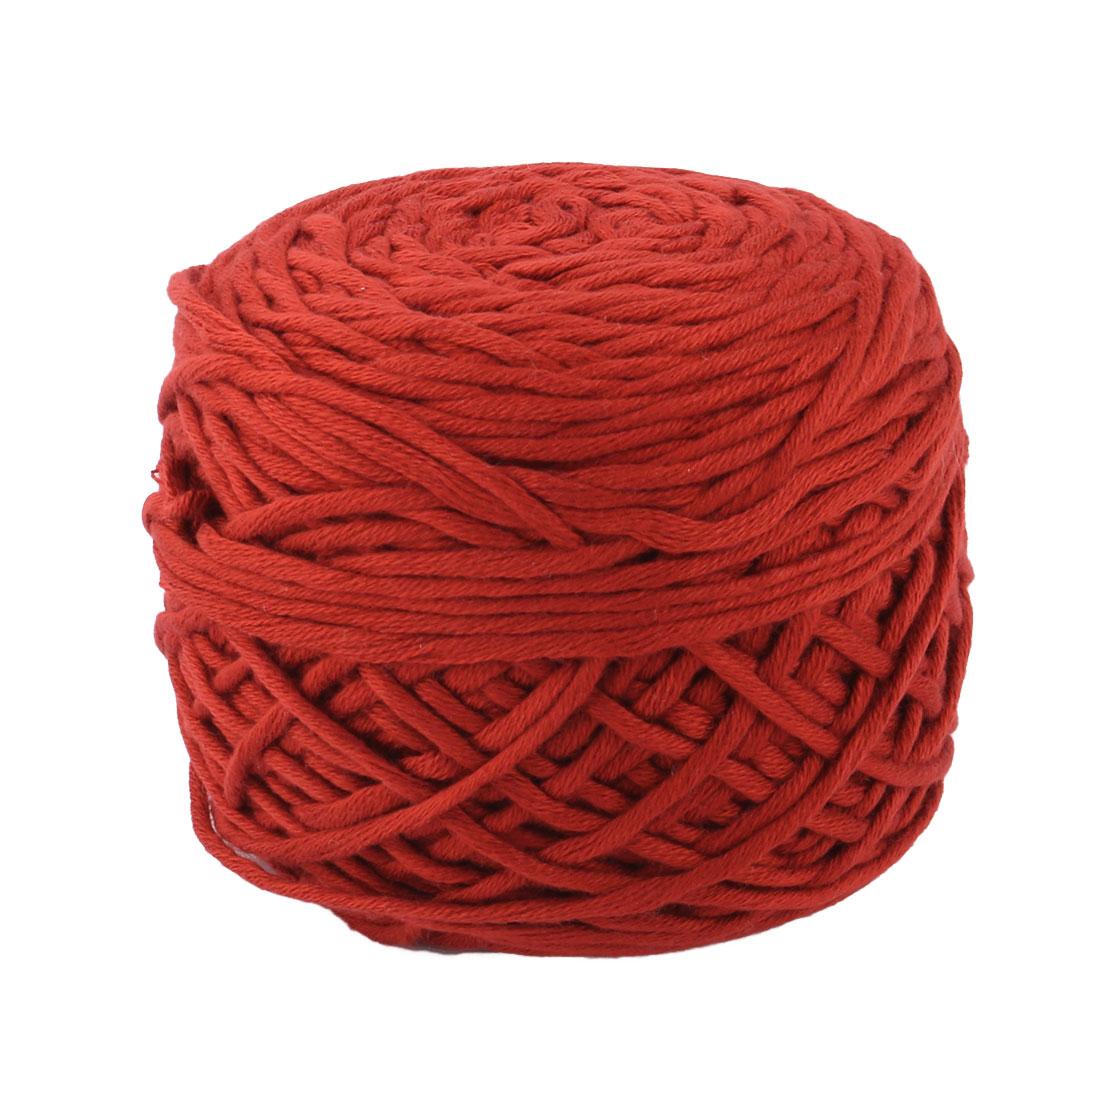 Acrylic Fiber Handmade Crochet Socks Gloves Knitting Yarn Cord Brick Red 200g